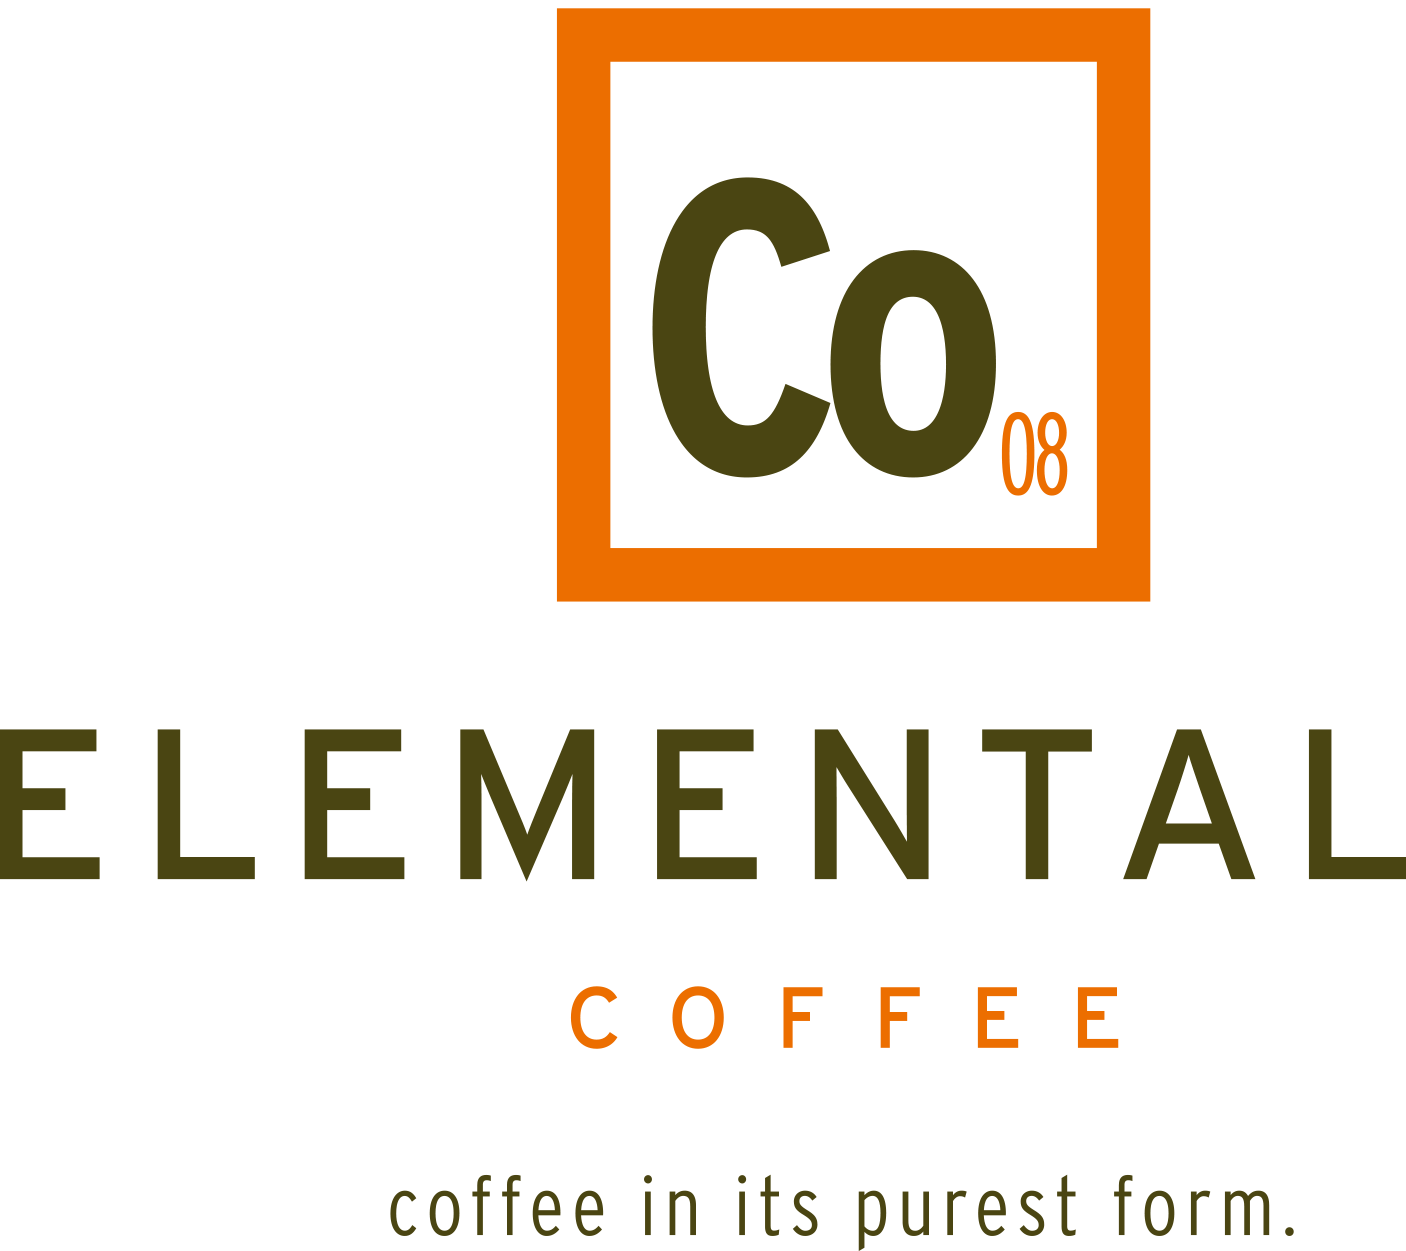 ELEcoffeeLogo.png